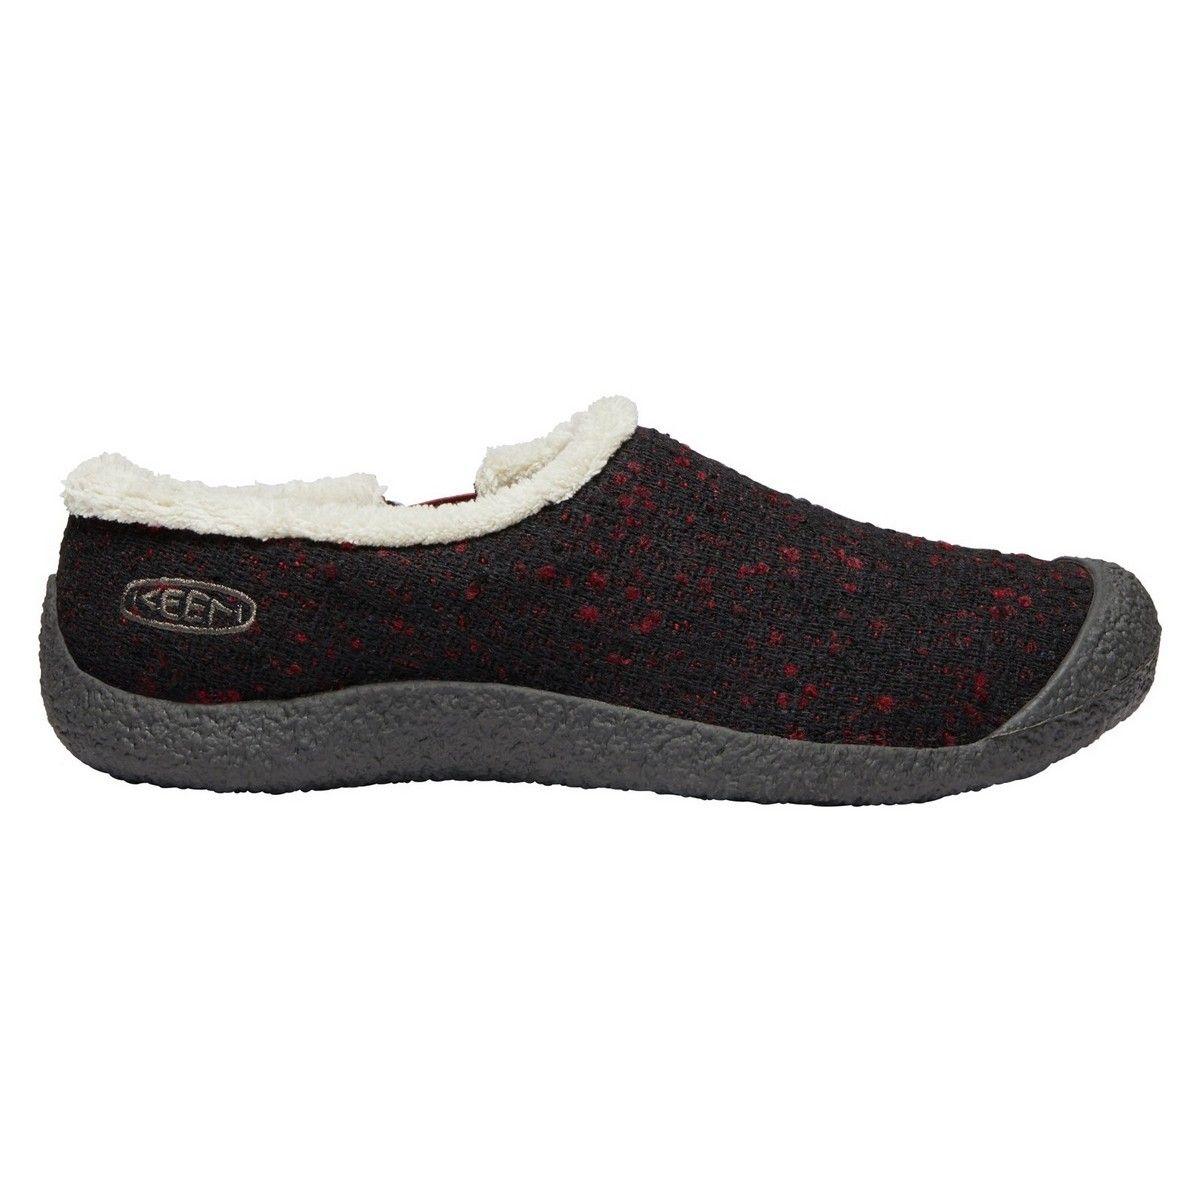 Howser Wool Slide - Women's